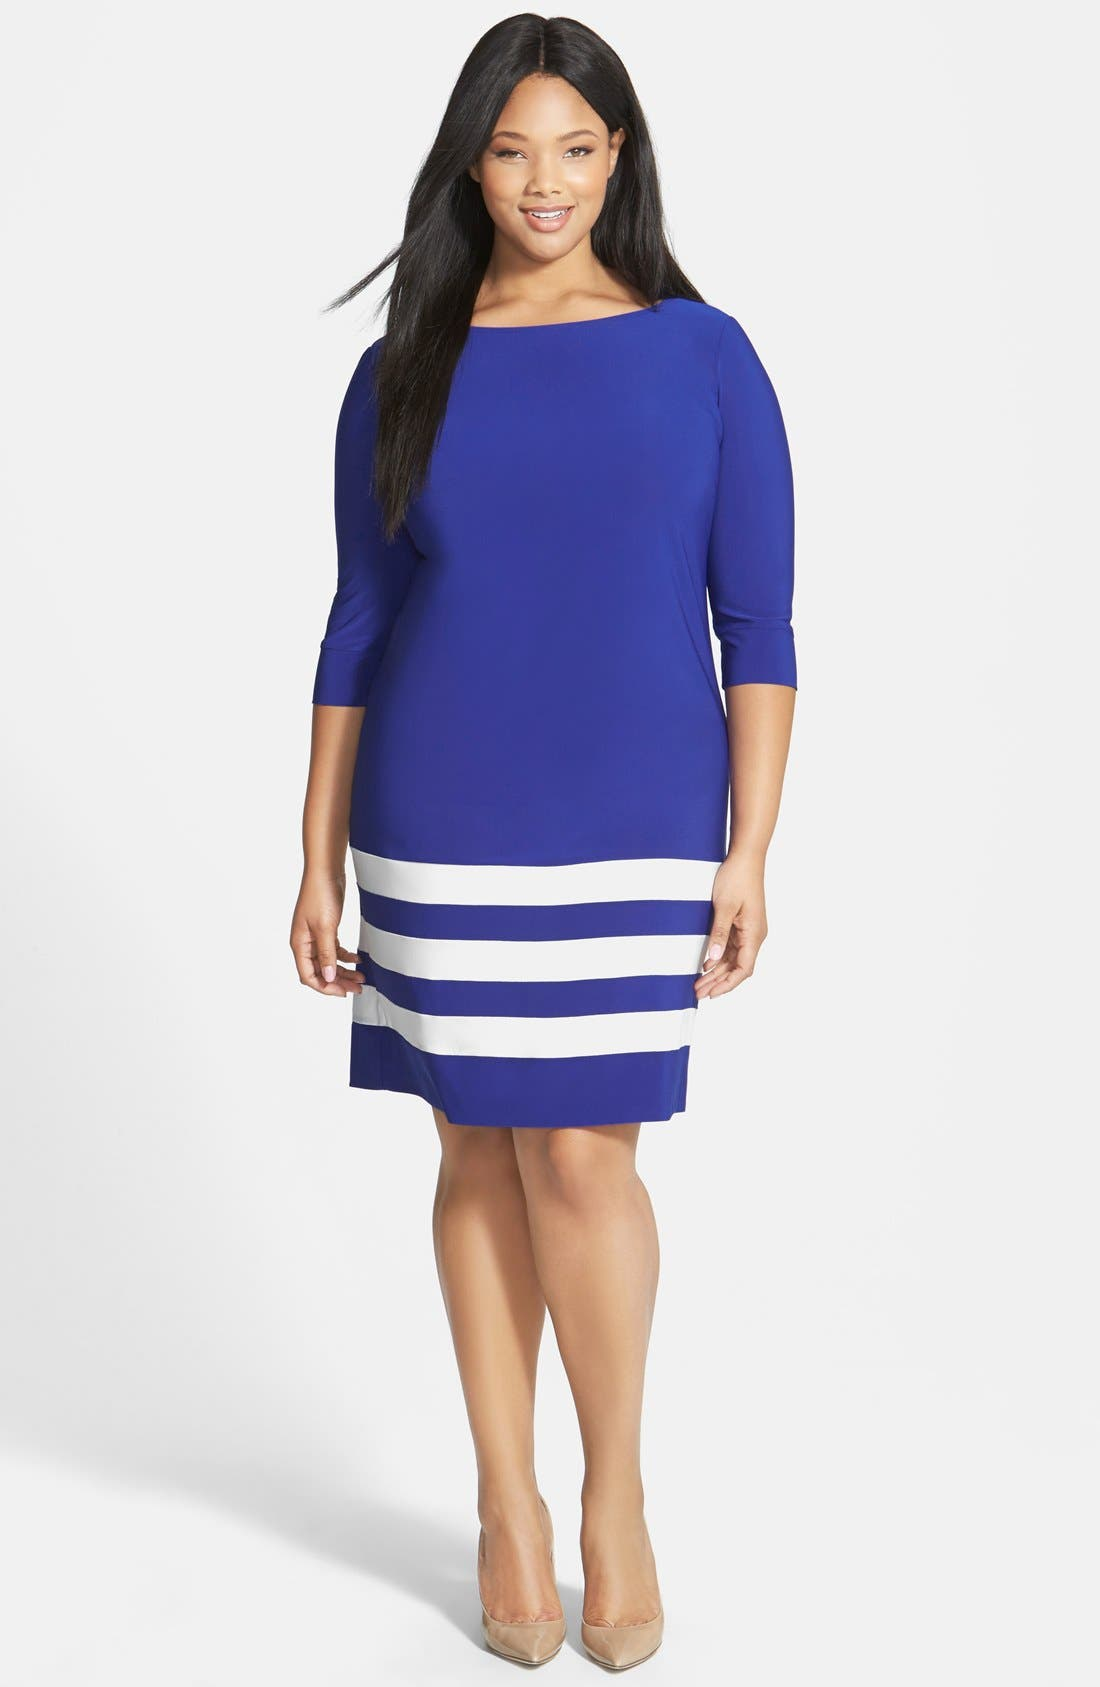 Main Image - ABS by Allen Schwartz Stripe Hem T-Shirt Dress (Plus Size)